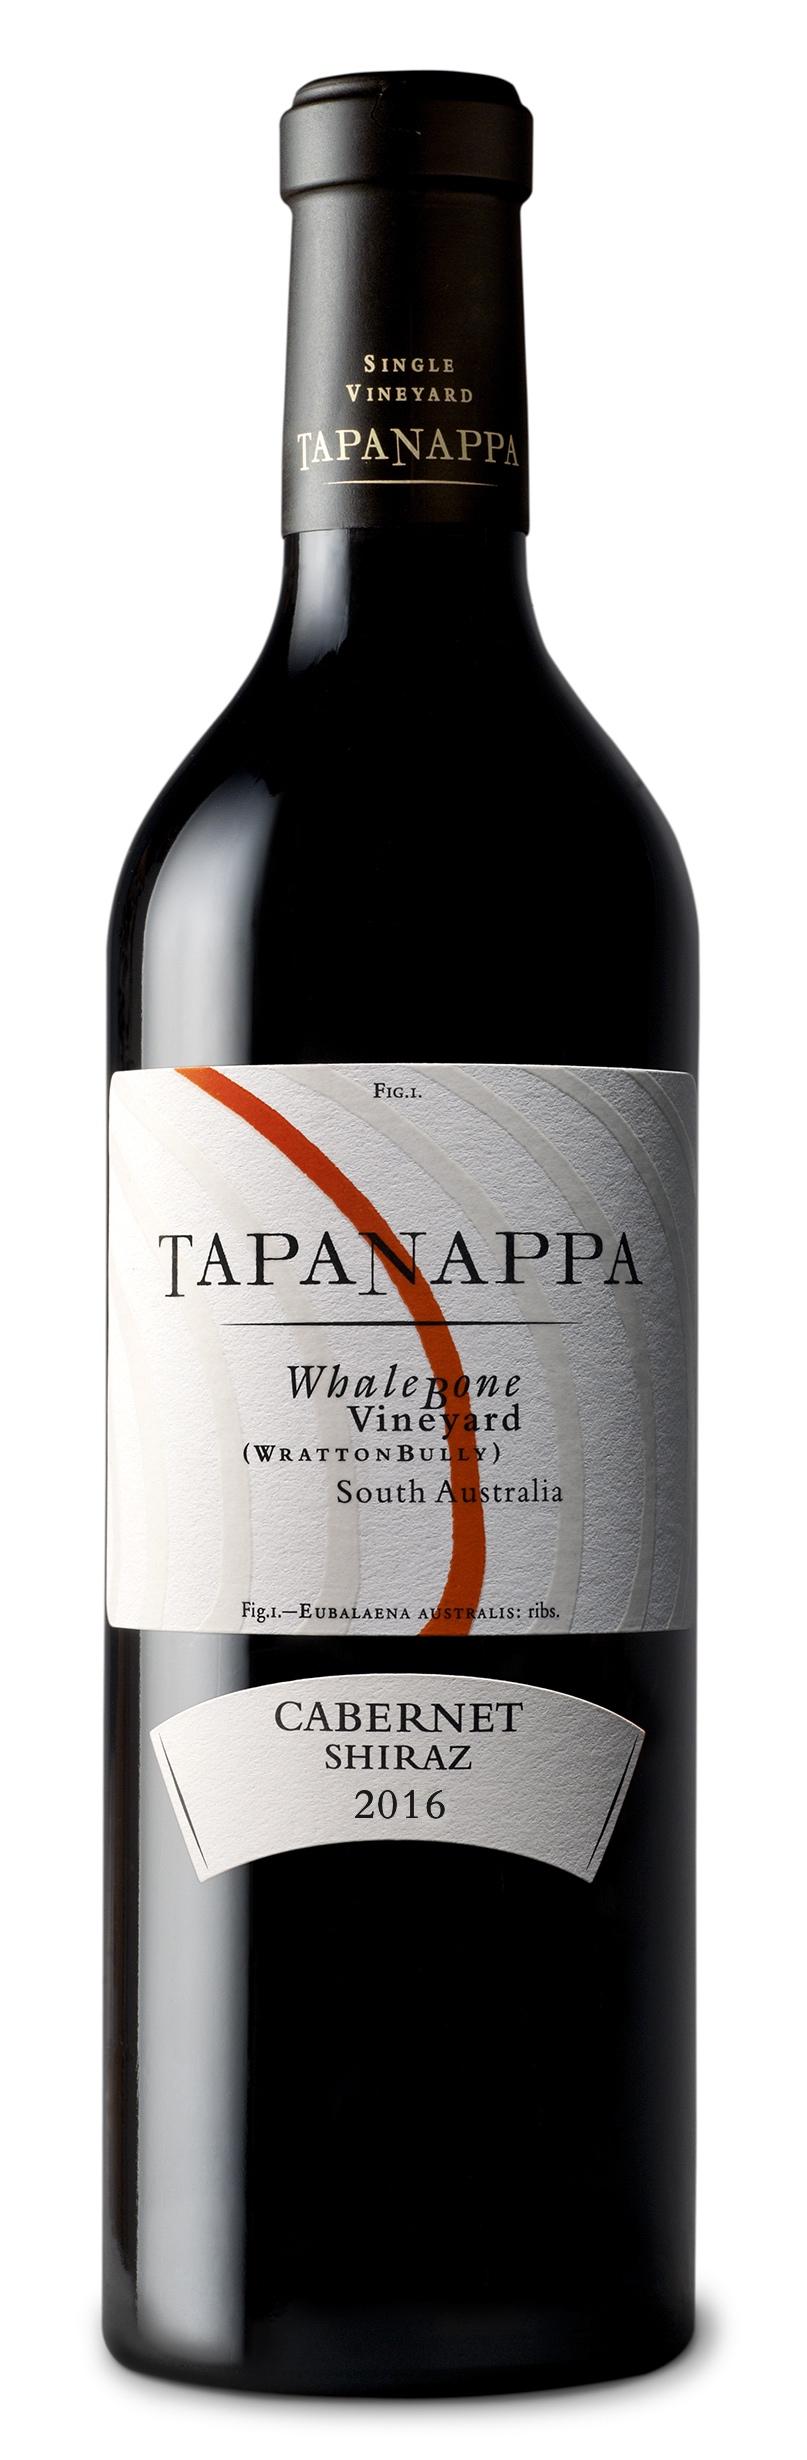 Tapanappa Whalebone Vineyard 2016 Cabernet Shiraz bottleshot